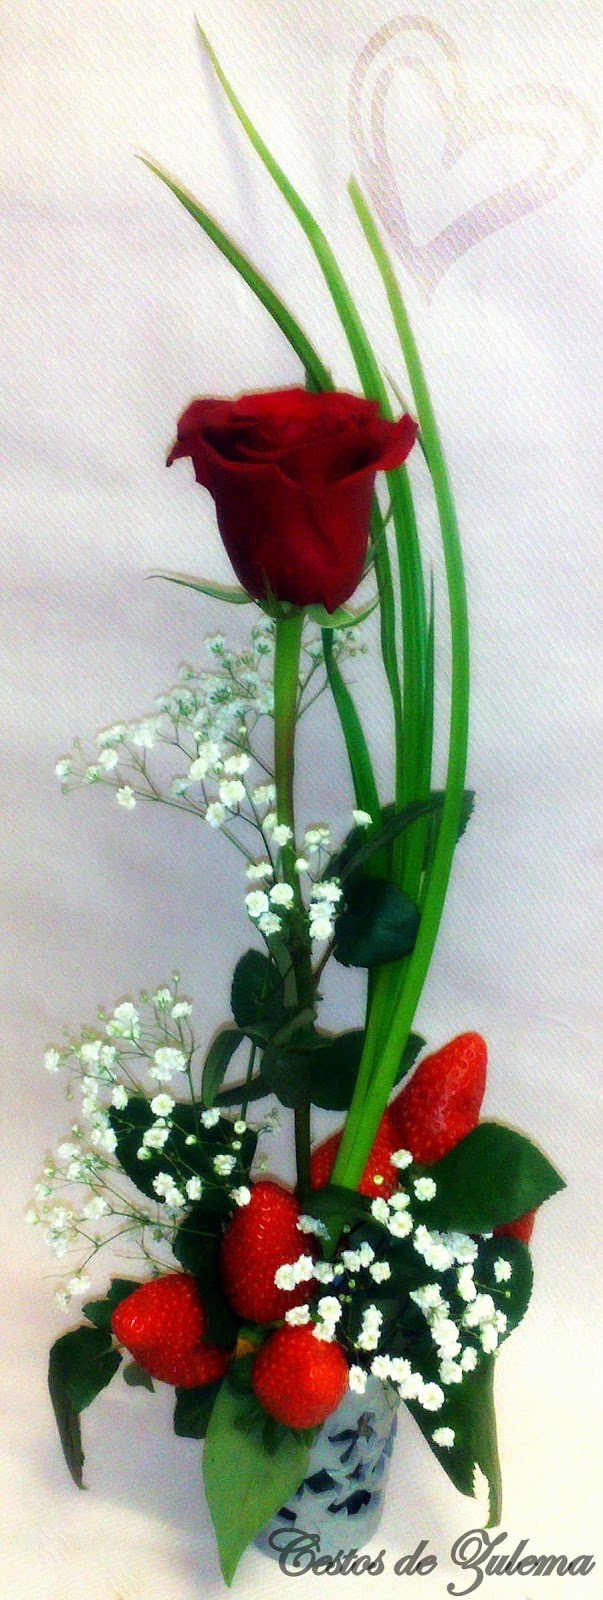 Ramo de Rosas rojas Descargar Fotos gratis Freepik